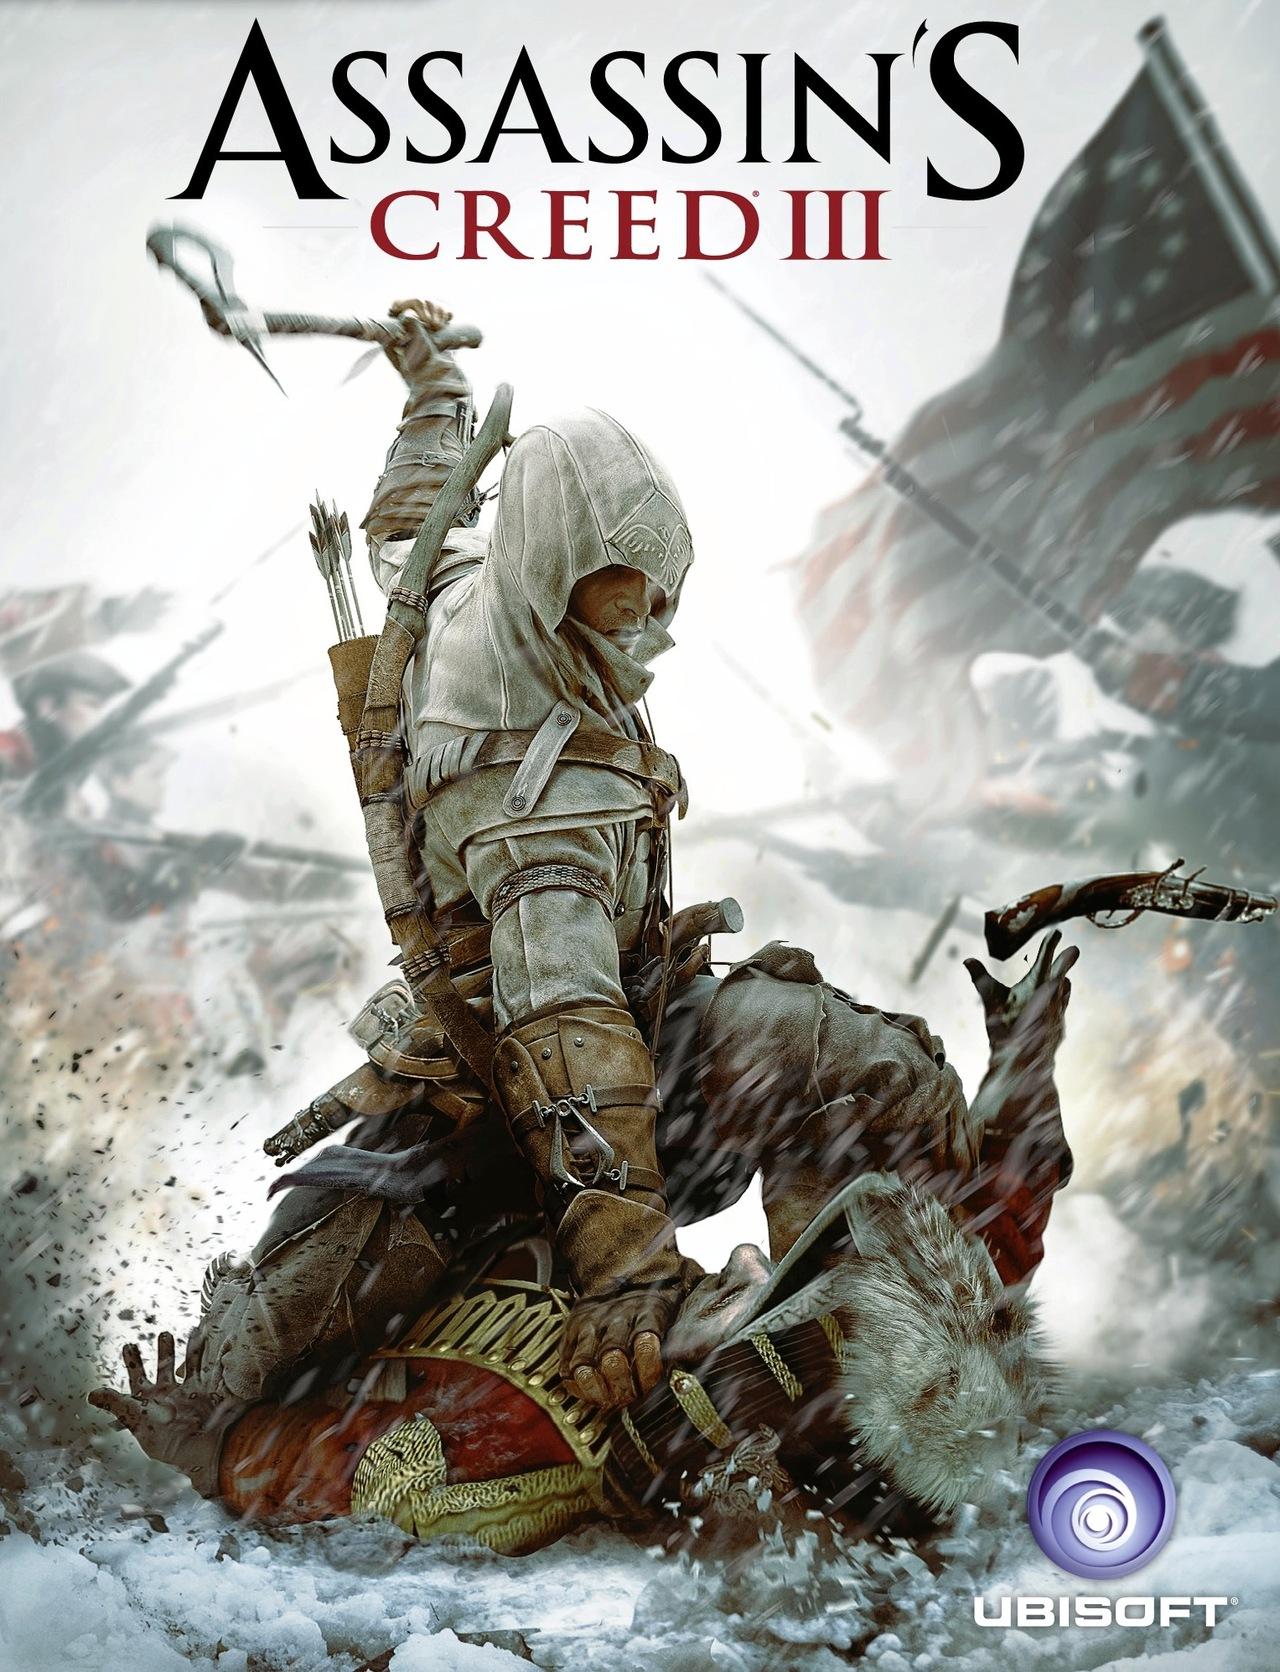 assassin-s-creed-iii-playstation-3-ps3-1330633468-001.jpg